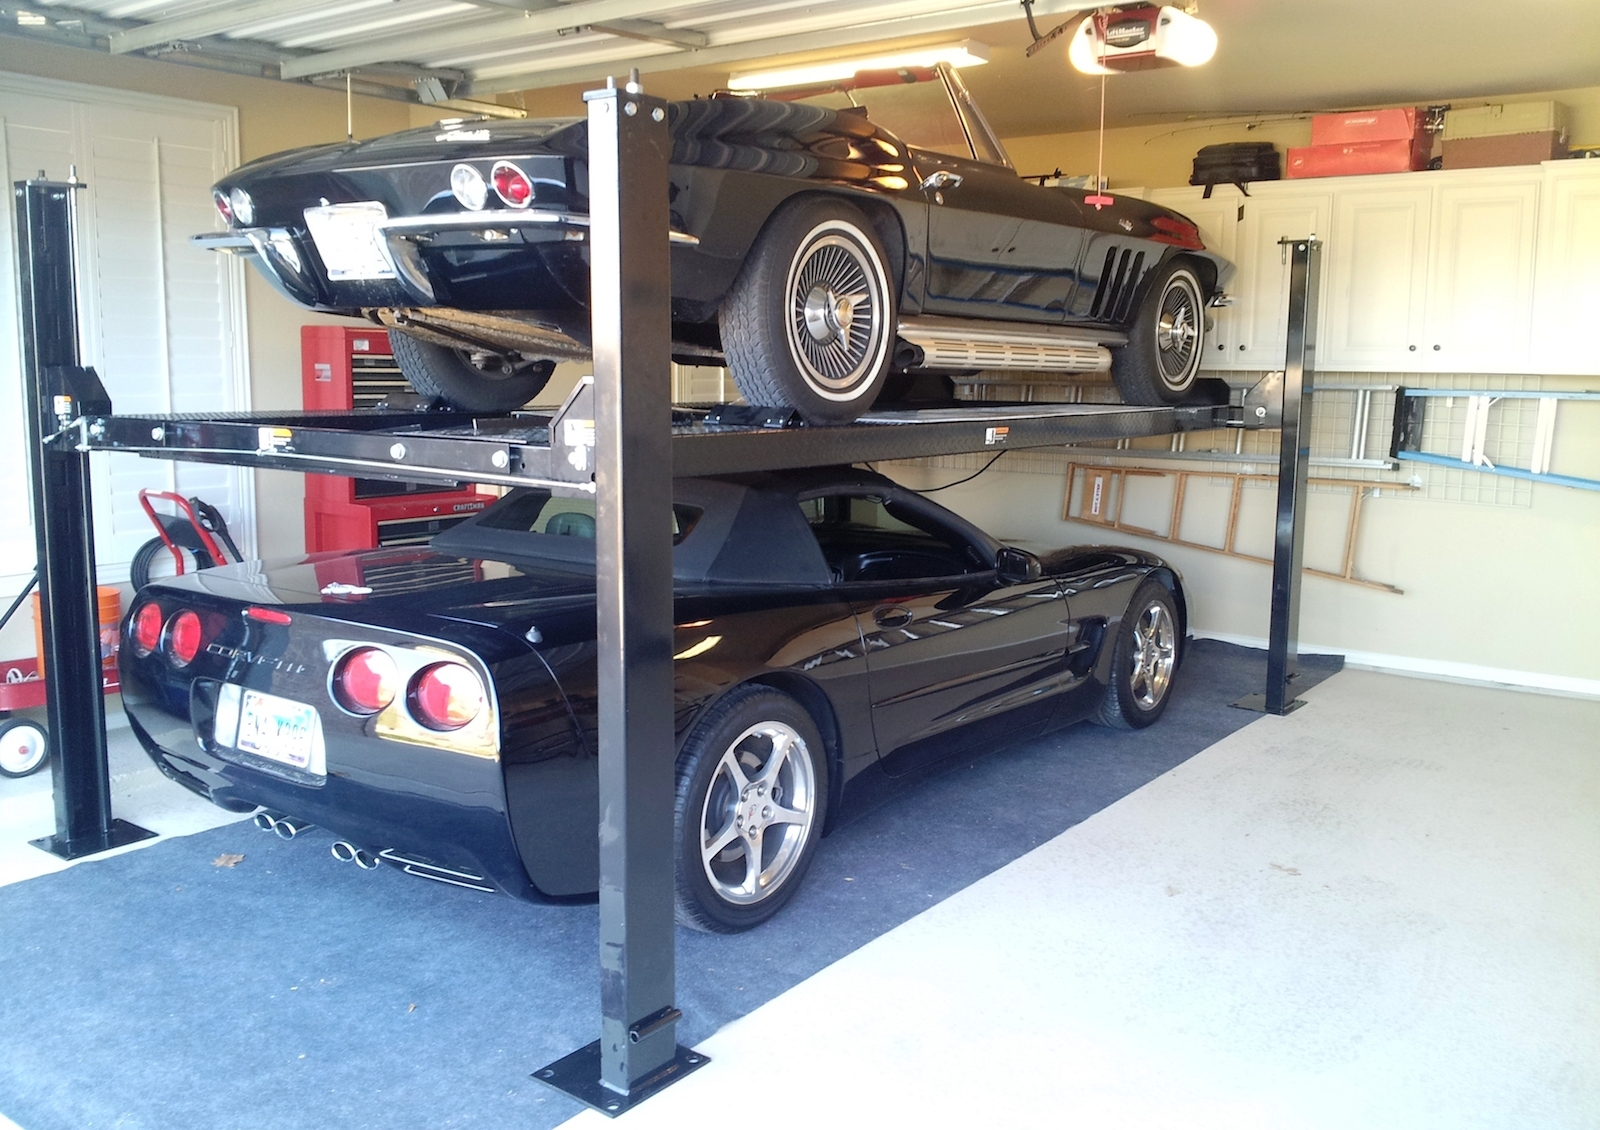 Electric Car Lift For Home Garage Schmidt Gallery Design